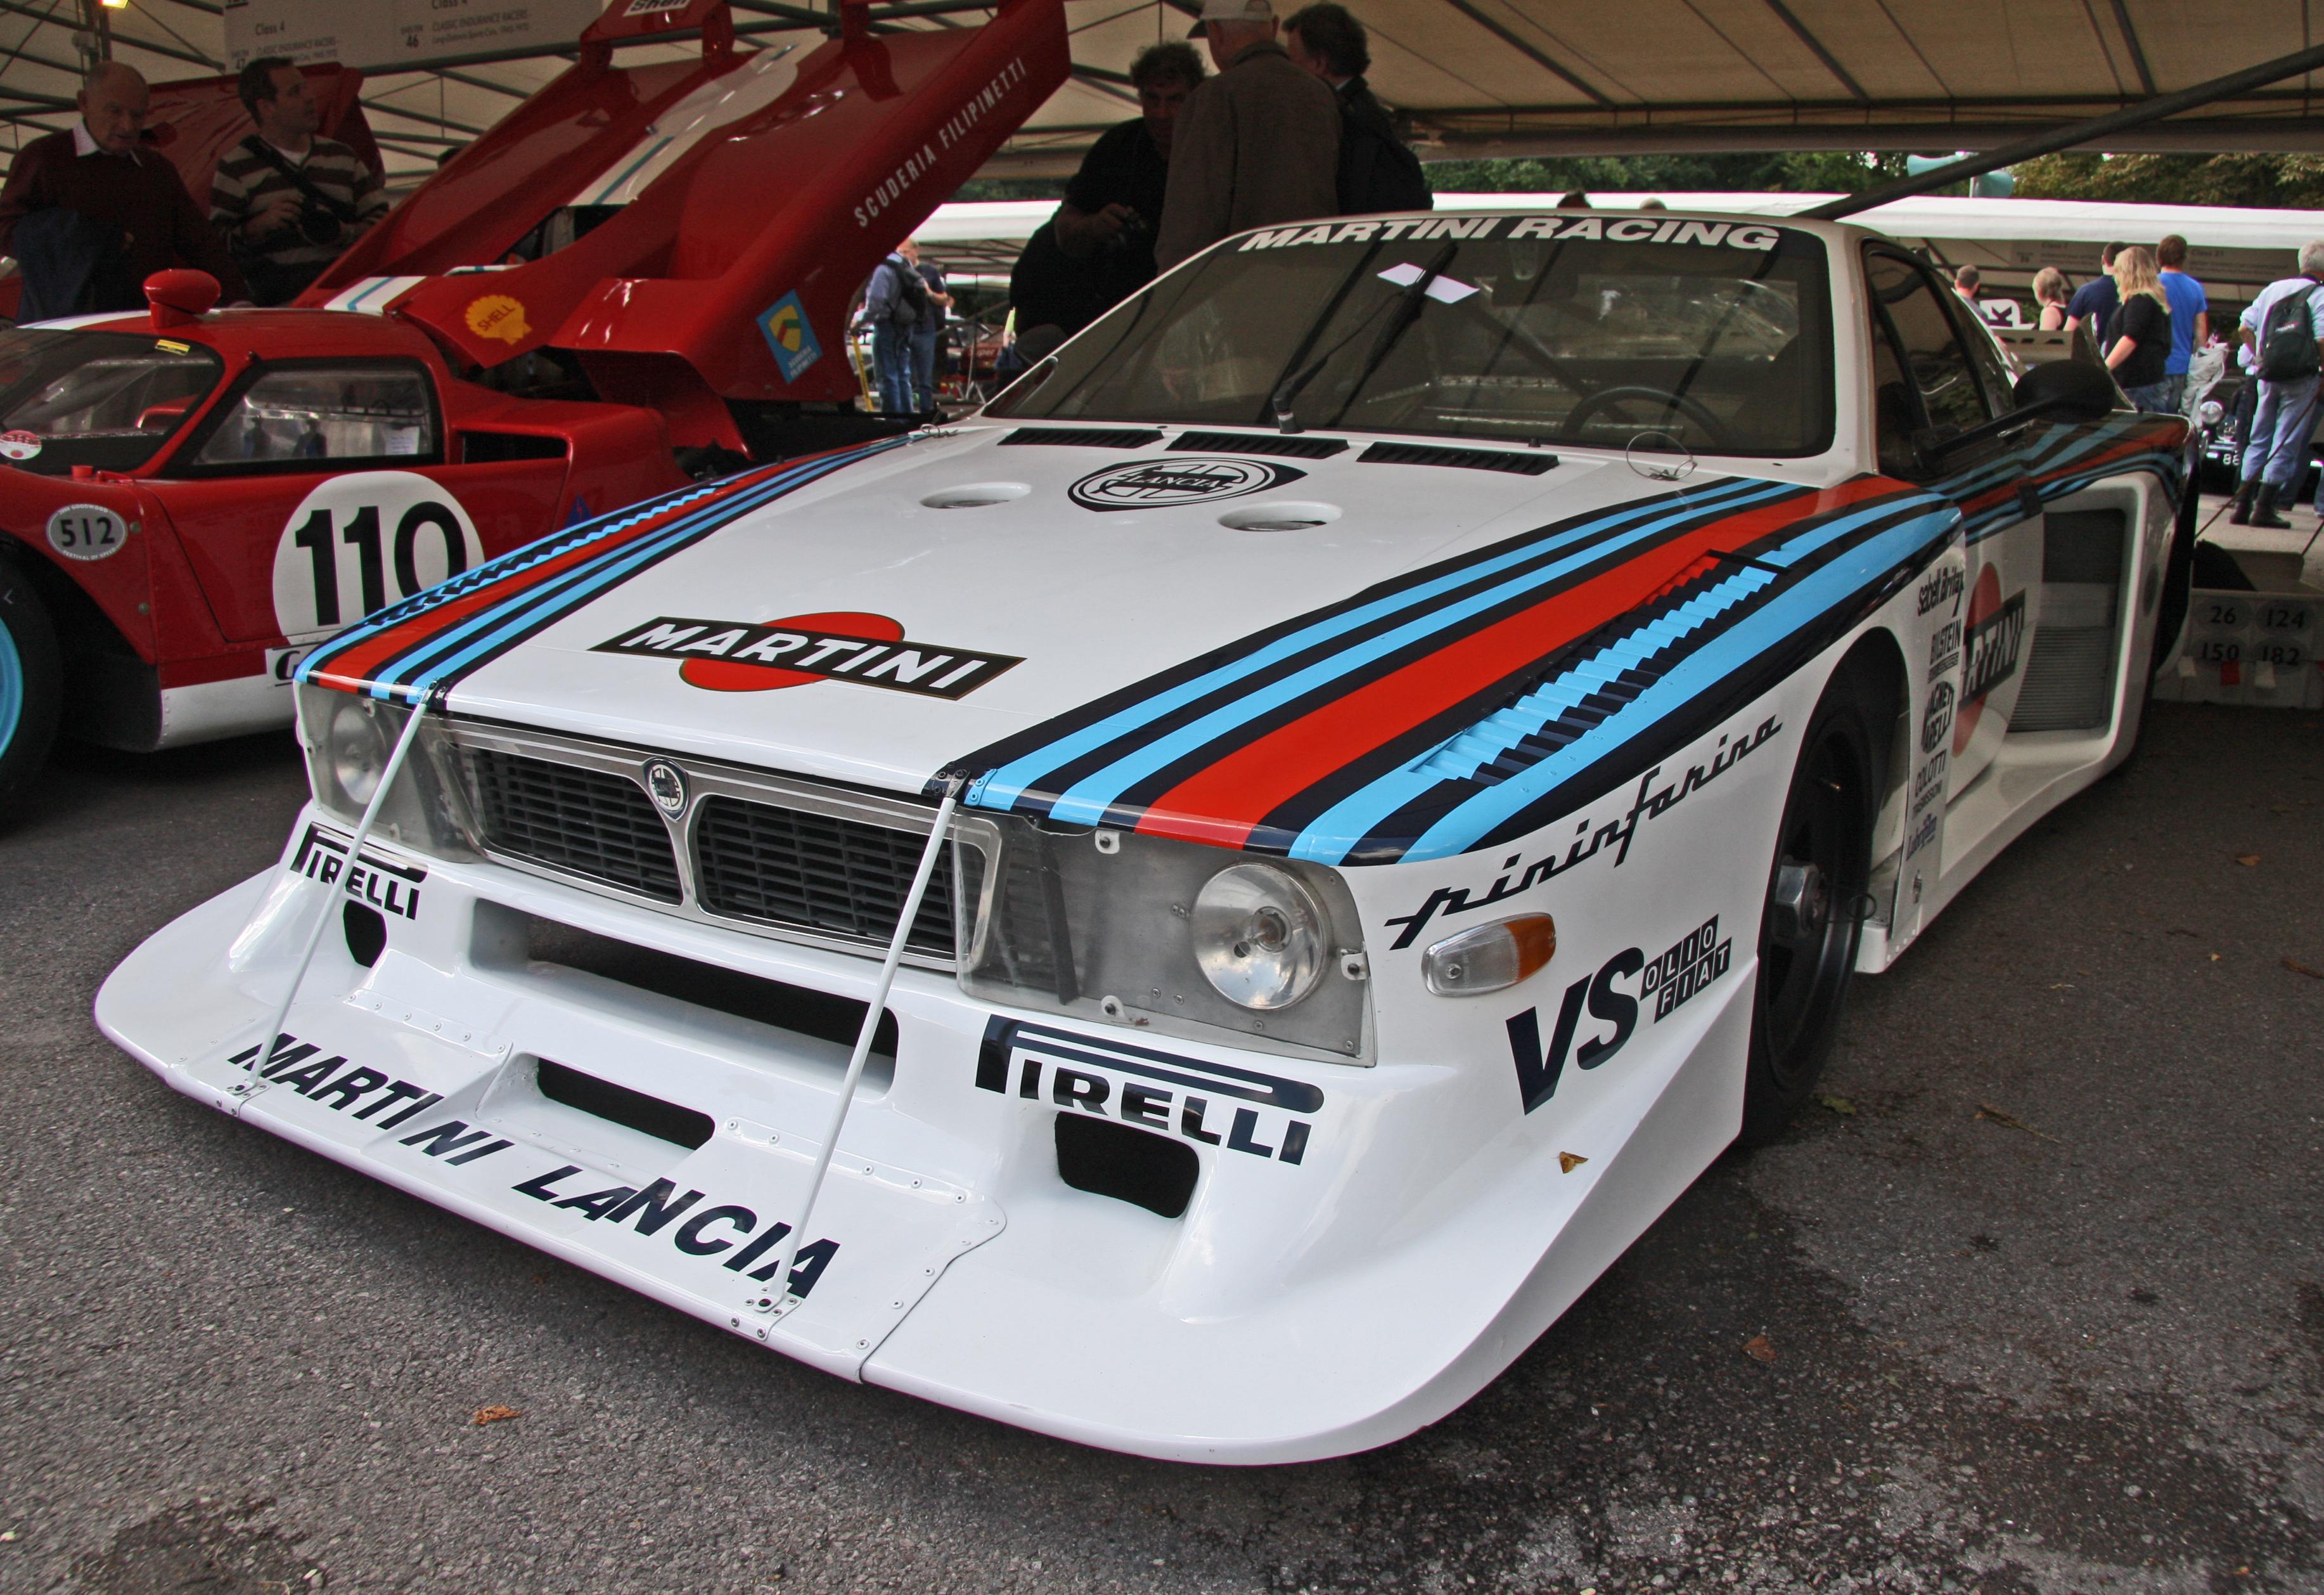 https://upload.wikimedia.org/wikipedia/commons/8/8e/Lancia_Beta_Montecarlo_Martini.jpg